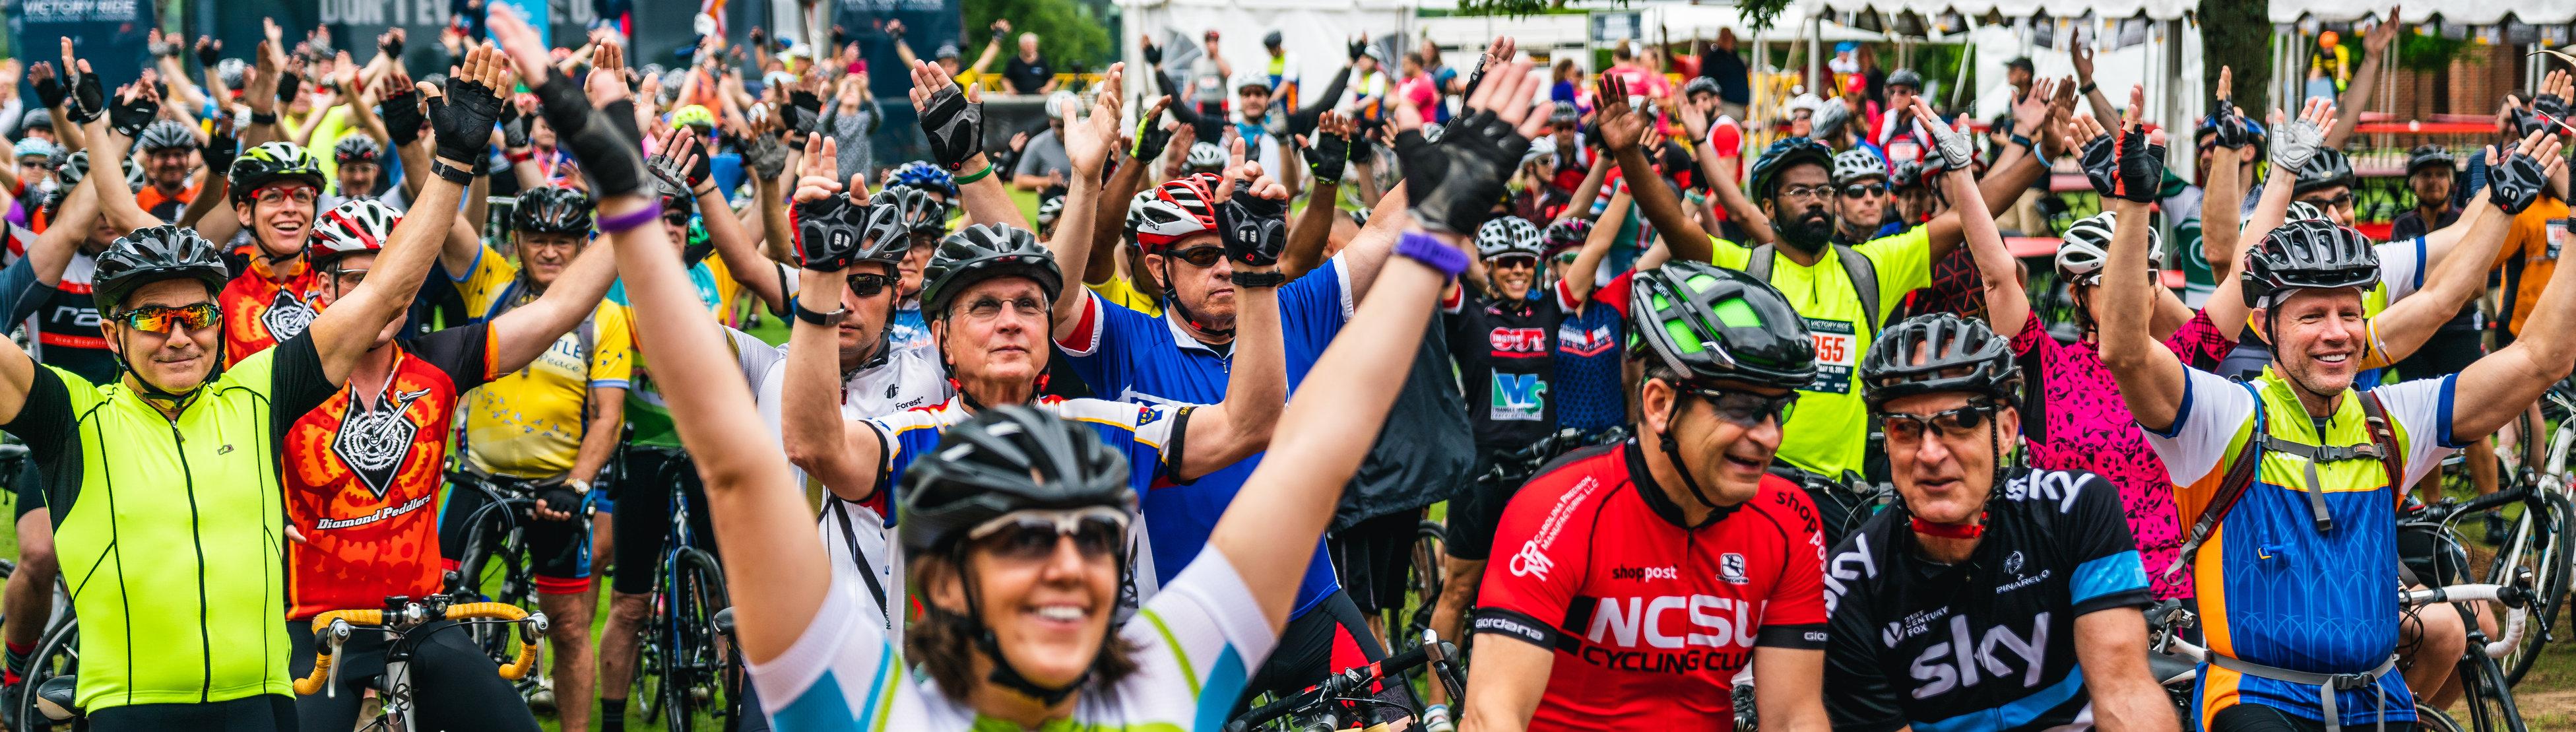 Victory Ride Banner Celebration